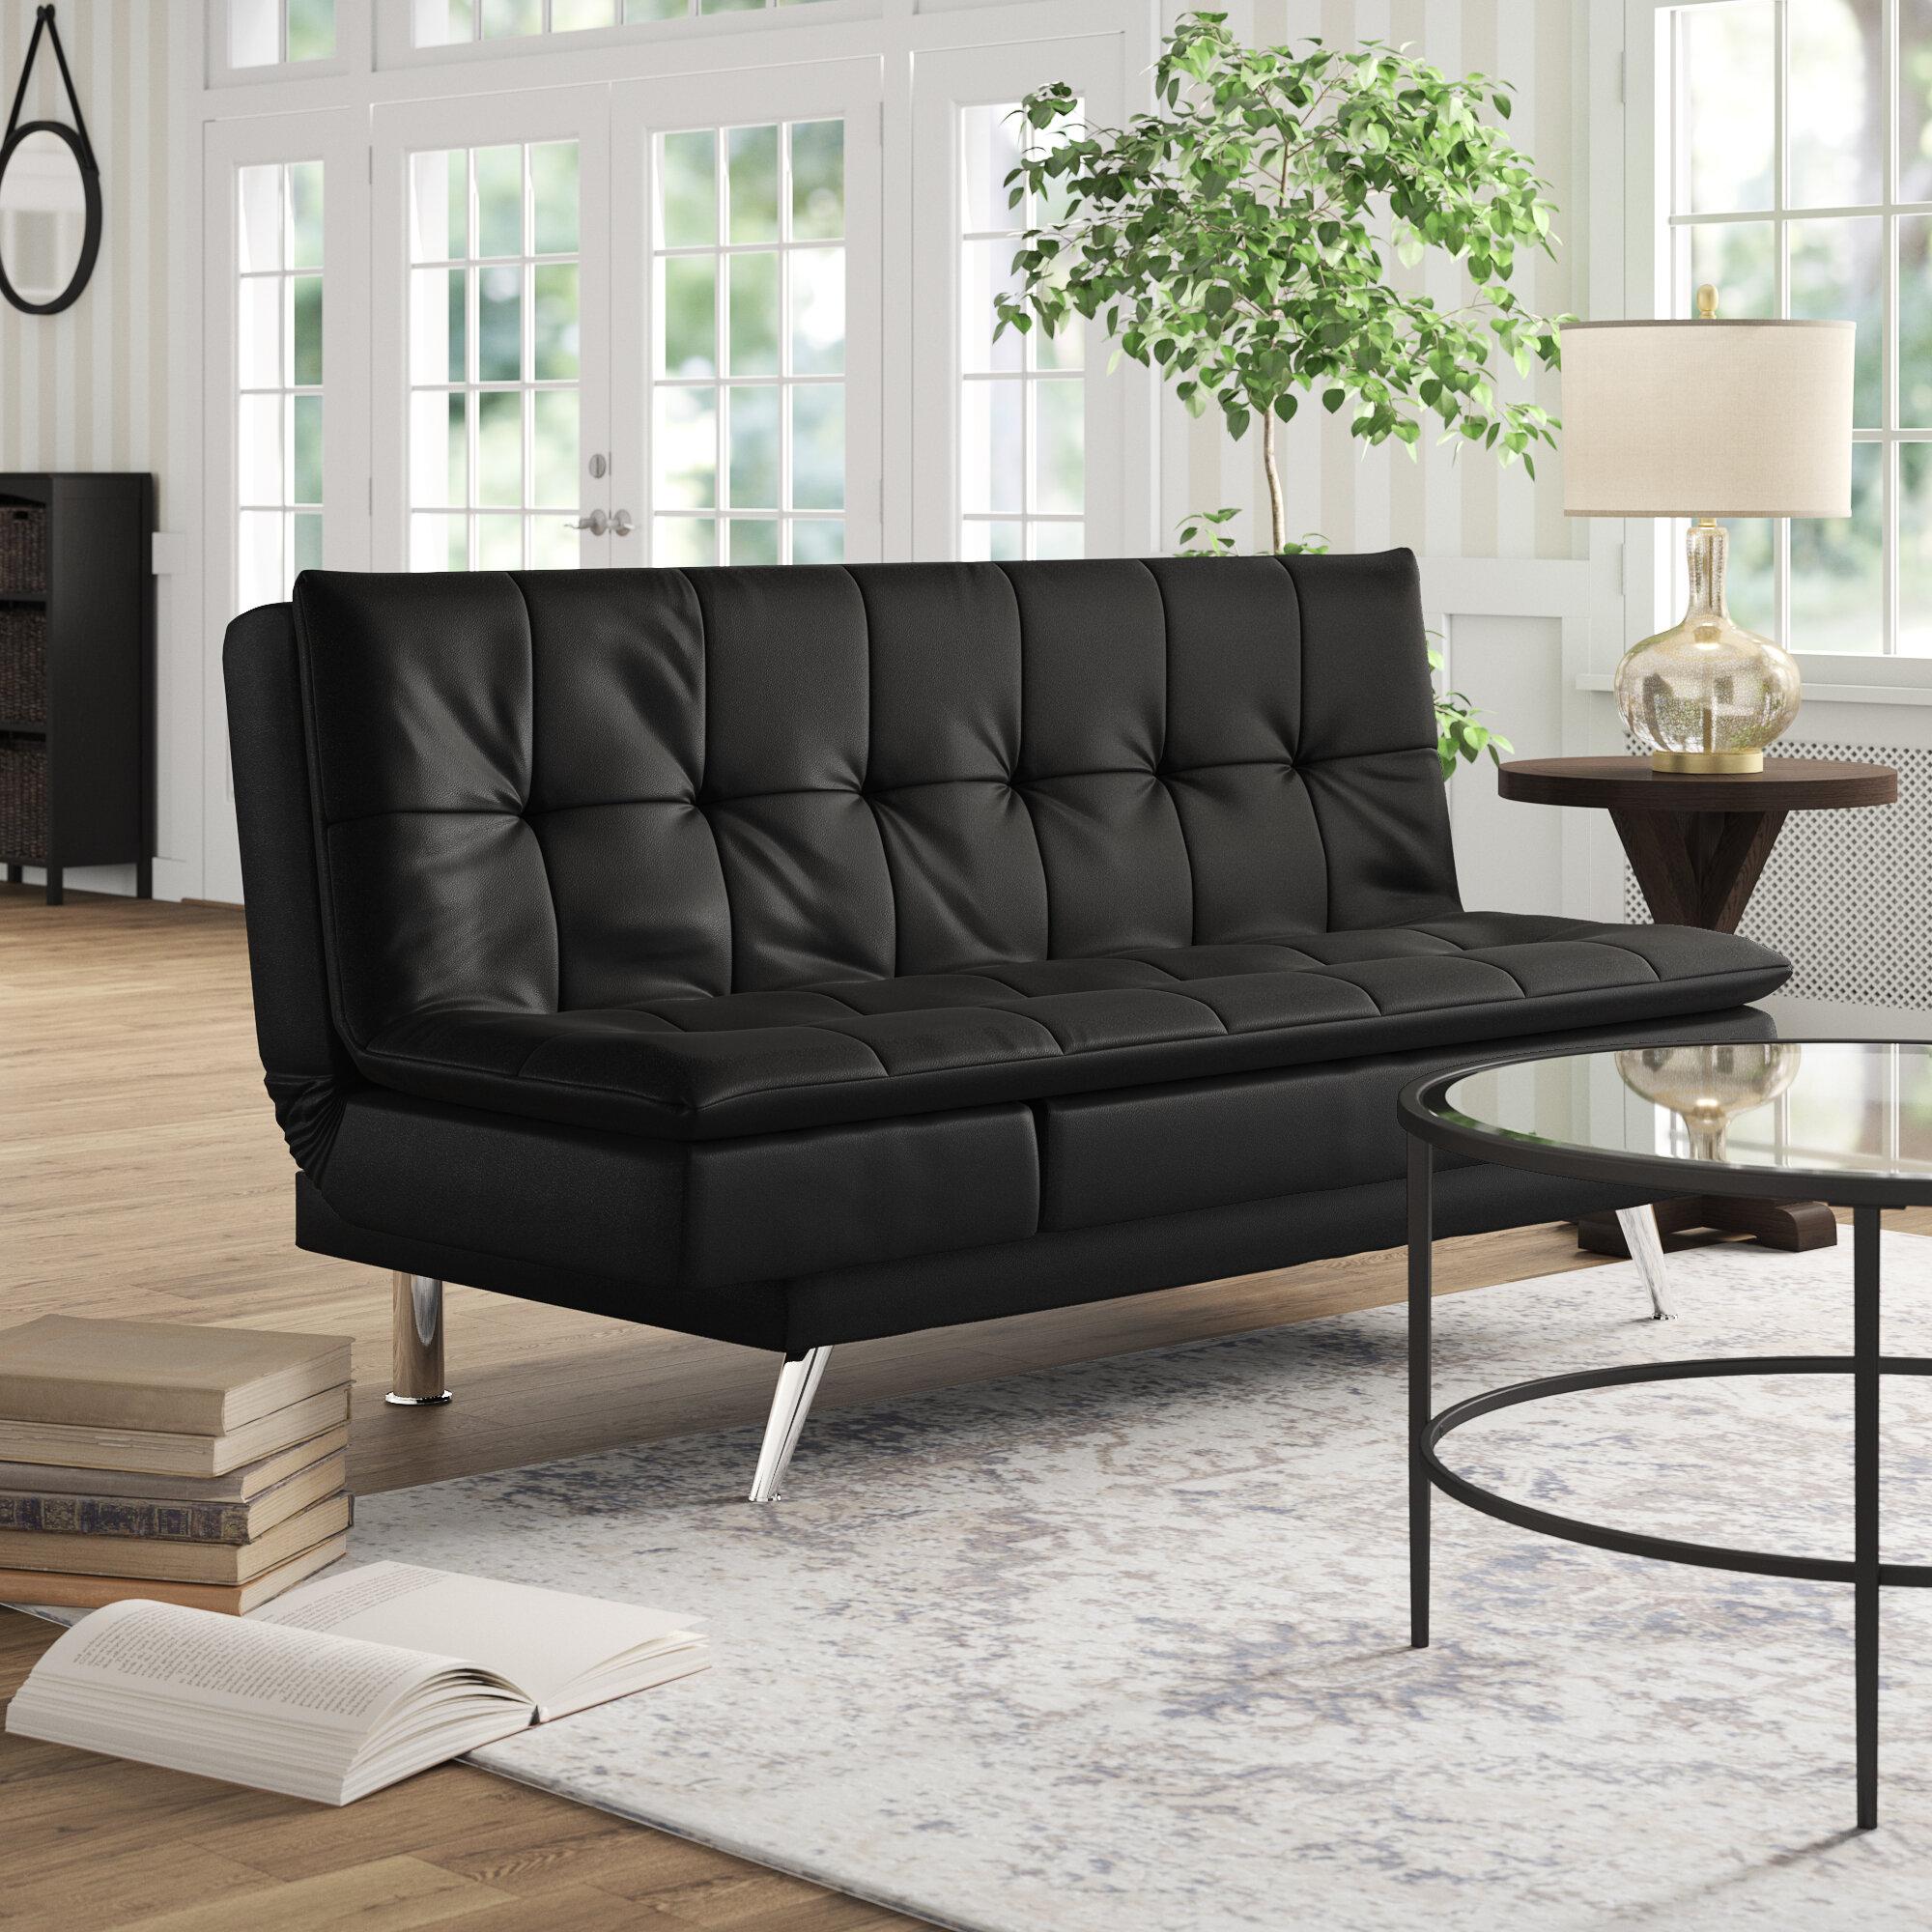 Latitude Run Black Leather Sleeper Sofa & Reviews | Wayfair